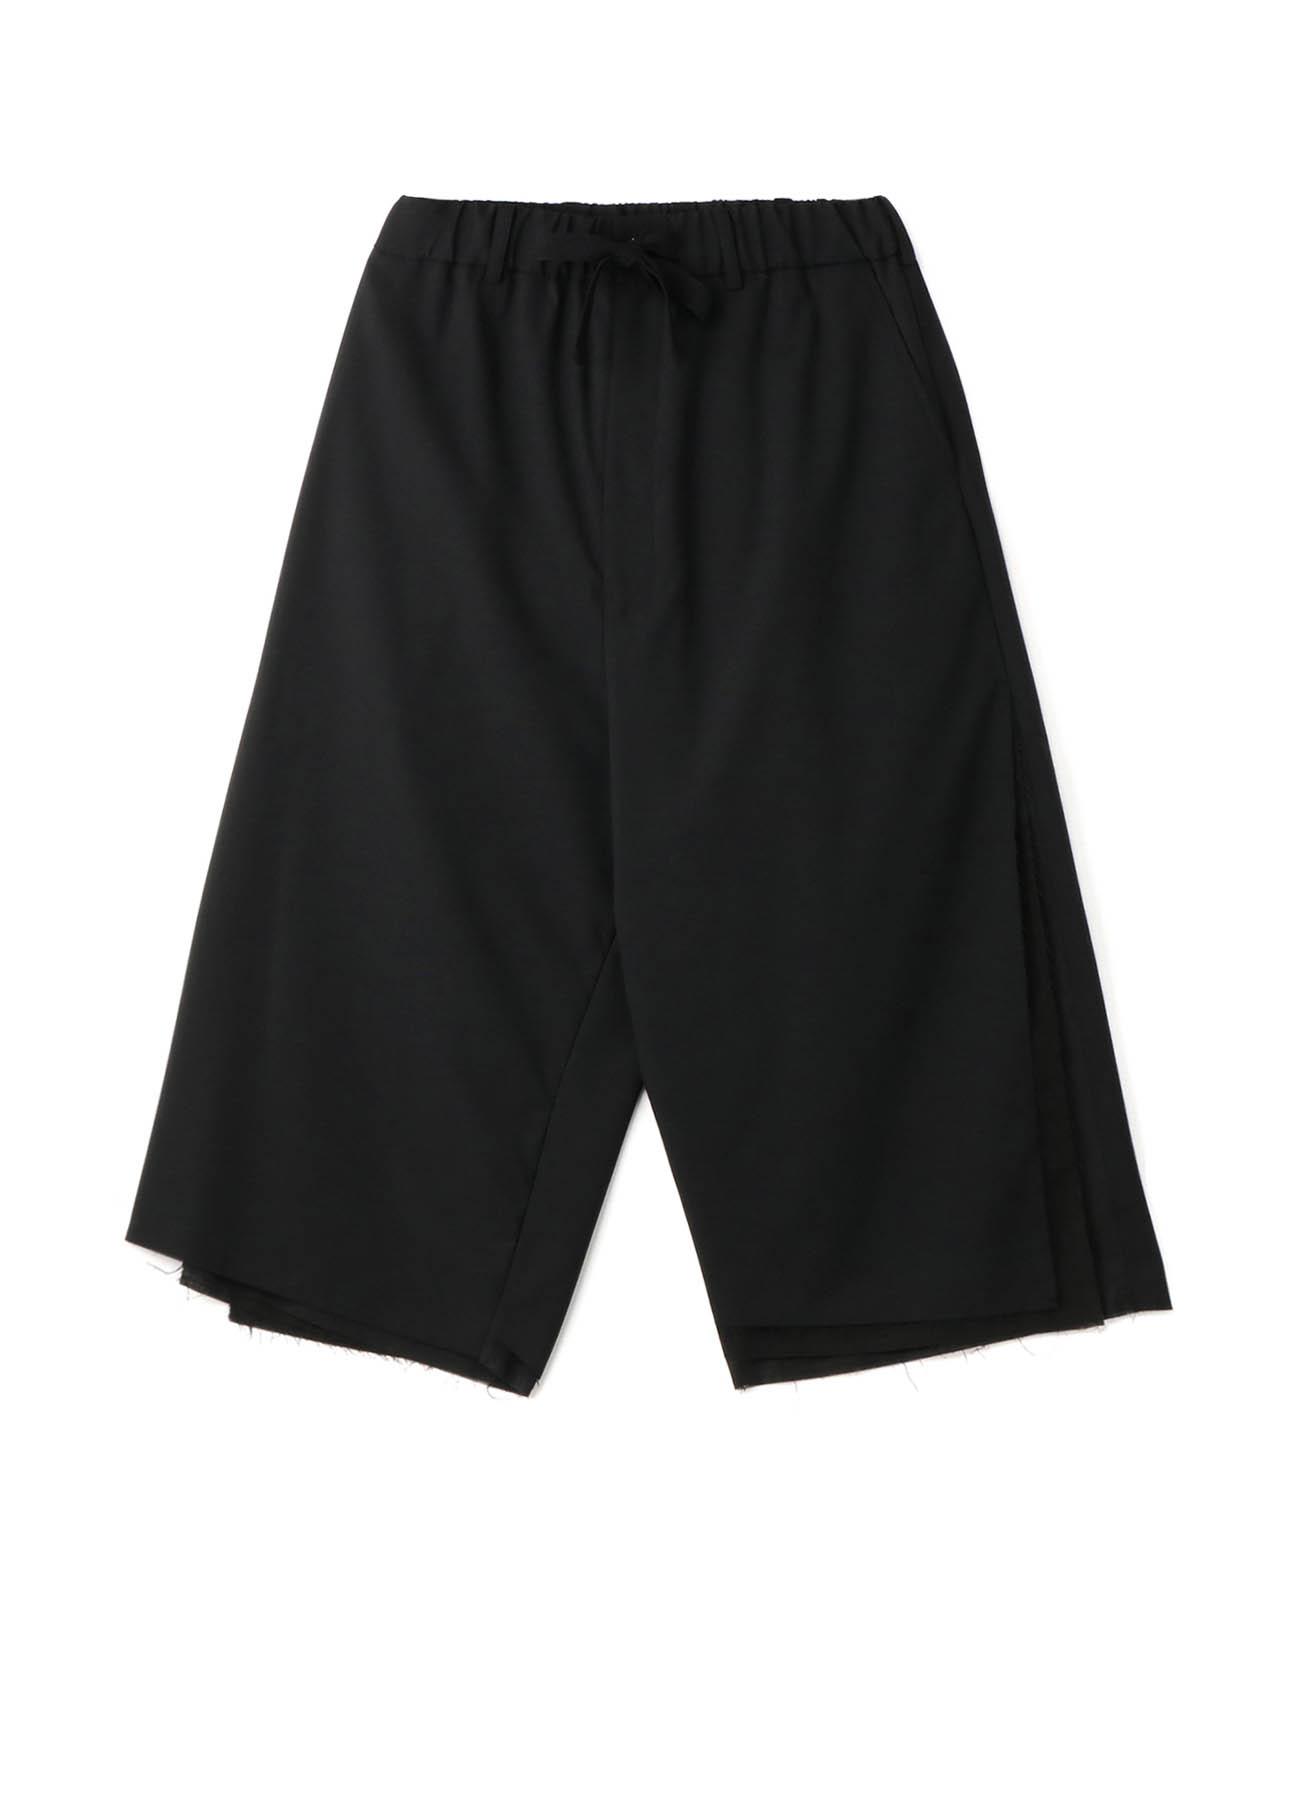 T/W Tropical Stretch 3 layers 6-quarter-length Pants